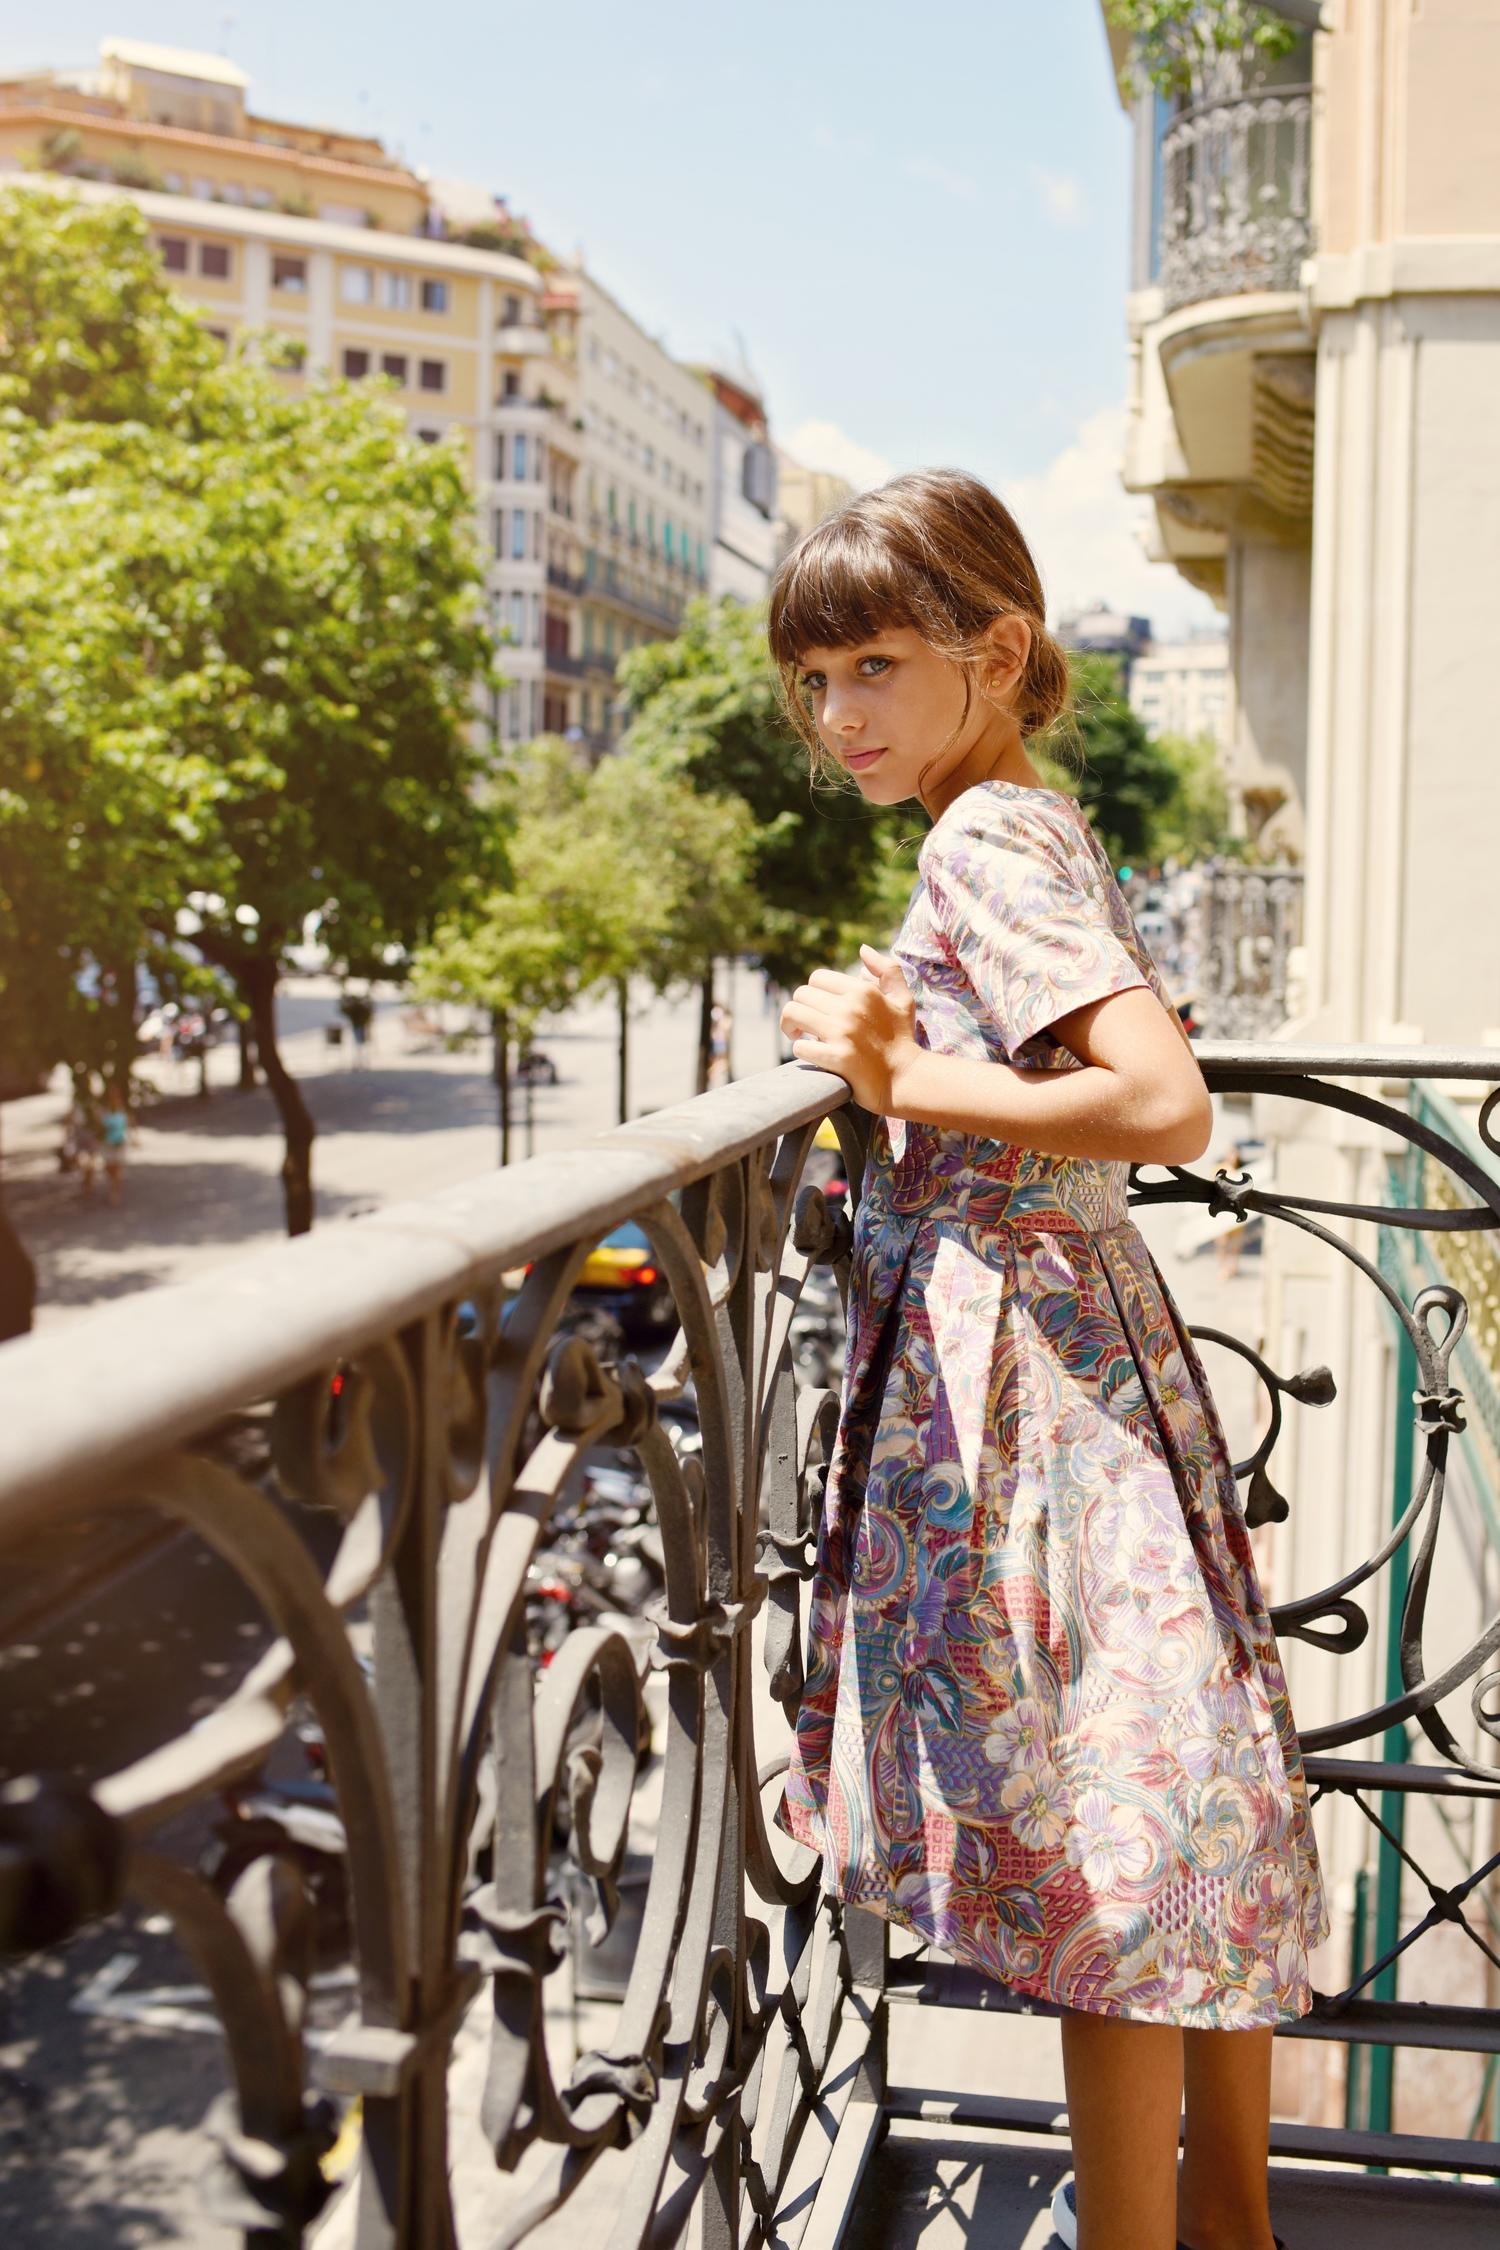 Enfant+Street+Style+by+Gina+Kim+Photography-14.jpeg